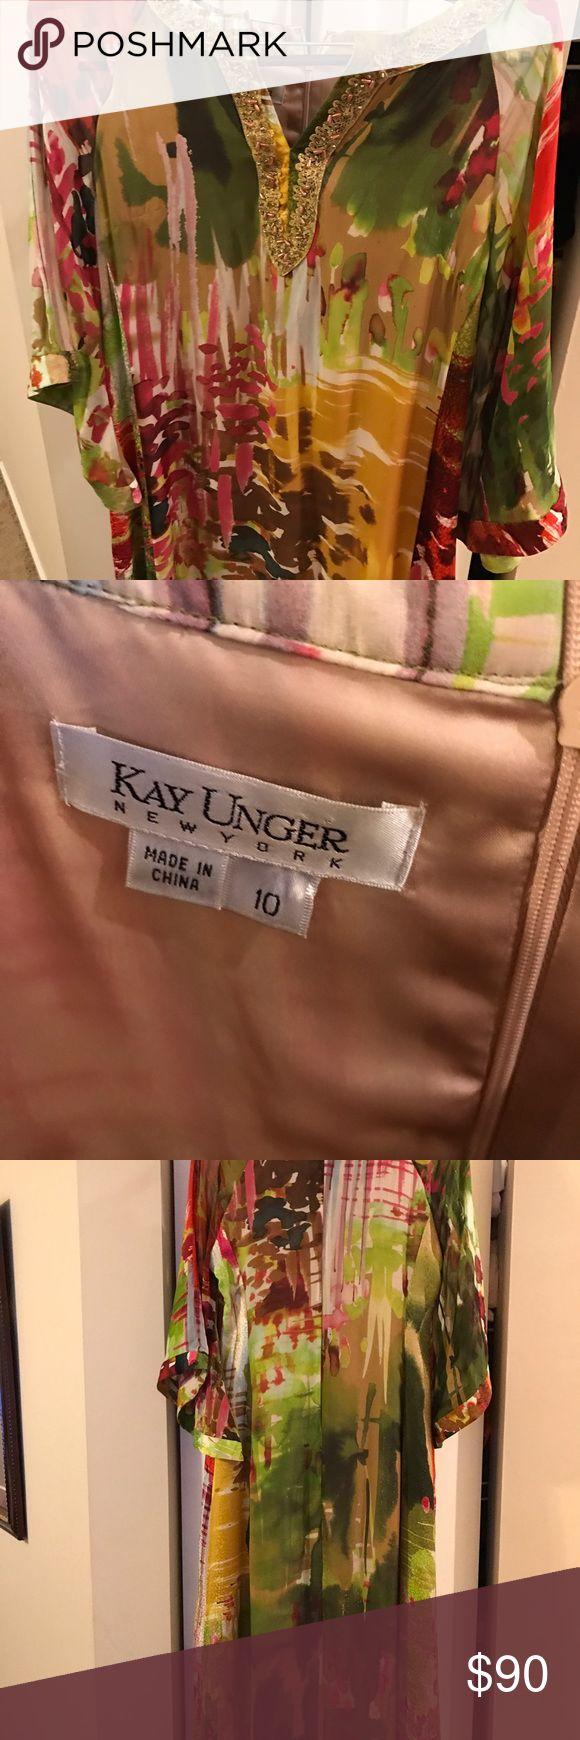 Kay Unger beautiful kimono type dress Most beautiful kimono Kay Unger Dress size 10. Just breathtaking. Kay Unger Dresses Maxi